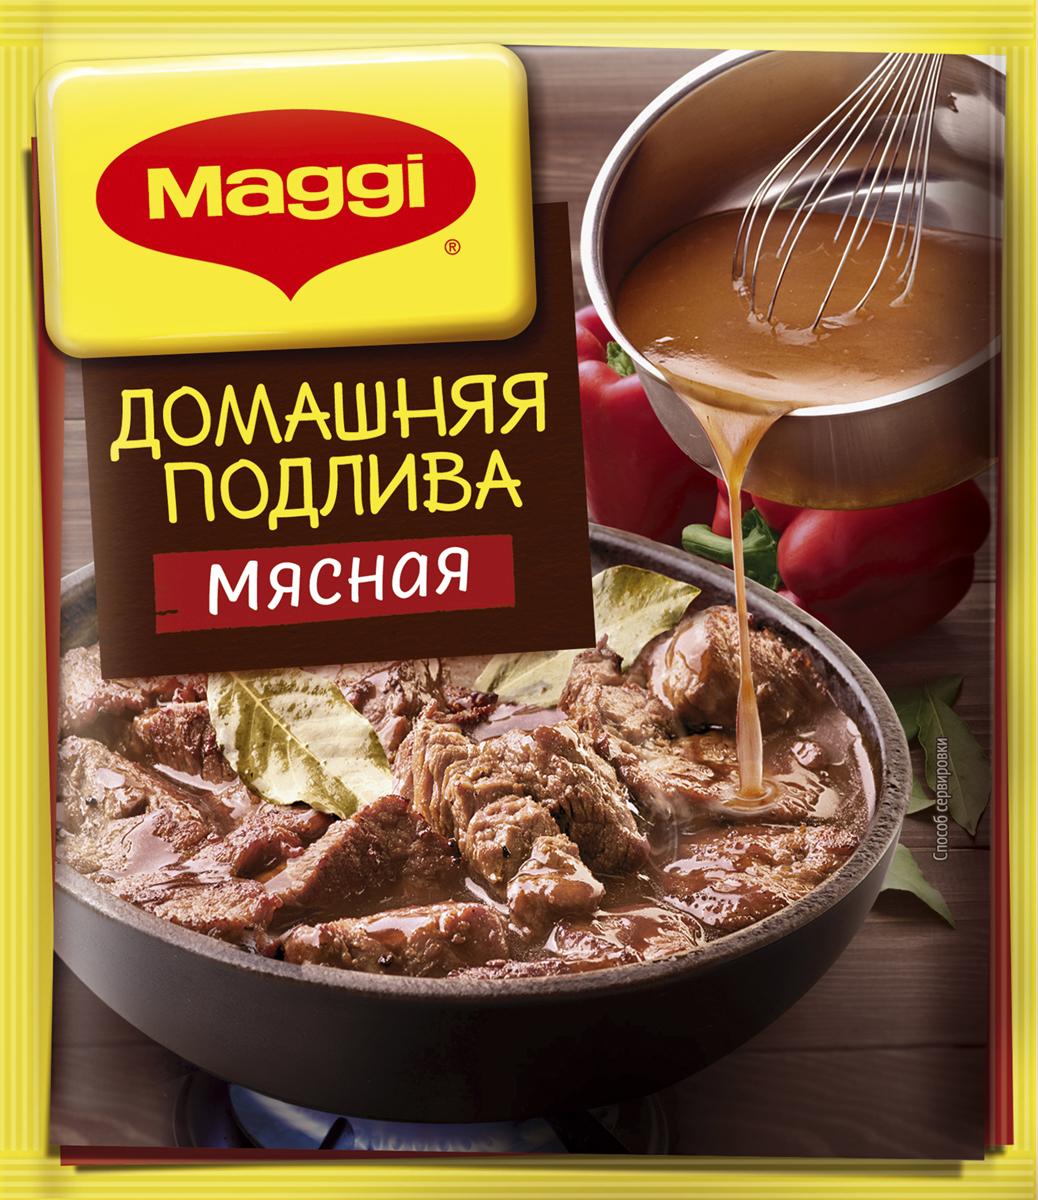 Maggi Подлива домашняя мясная, 90 г